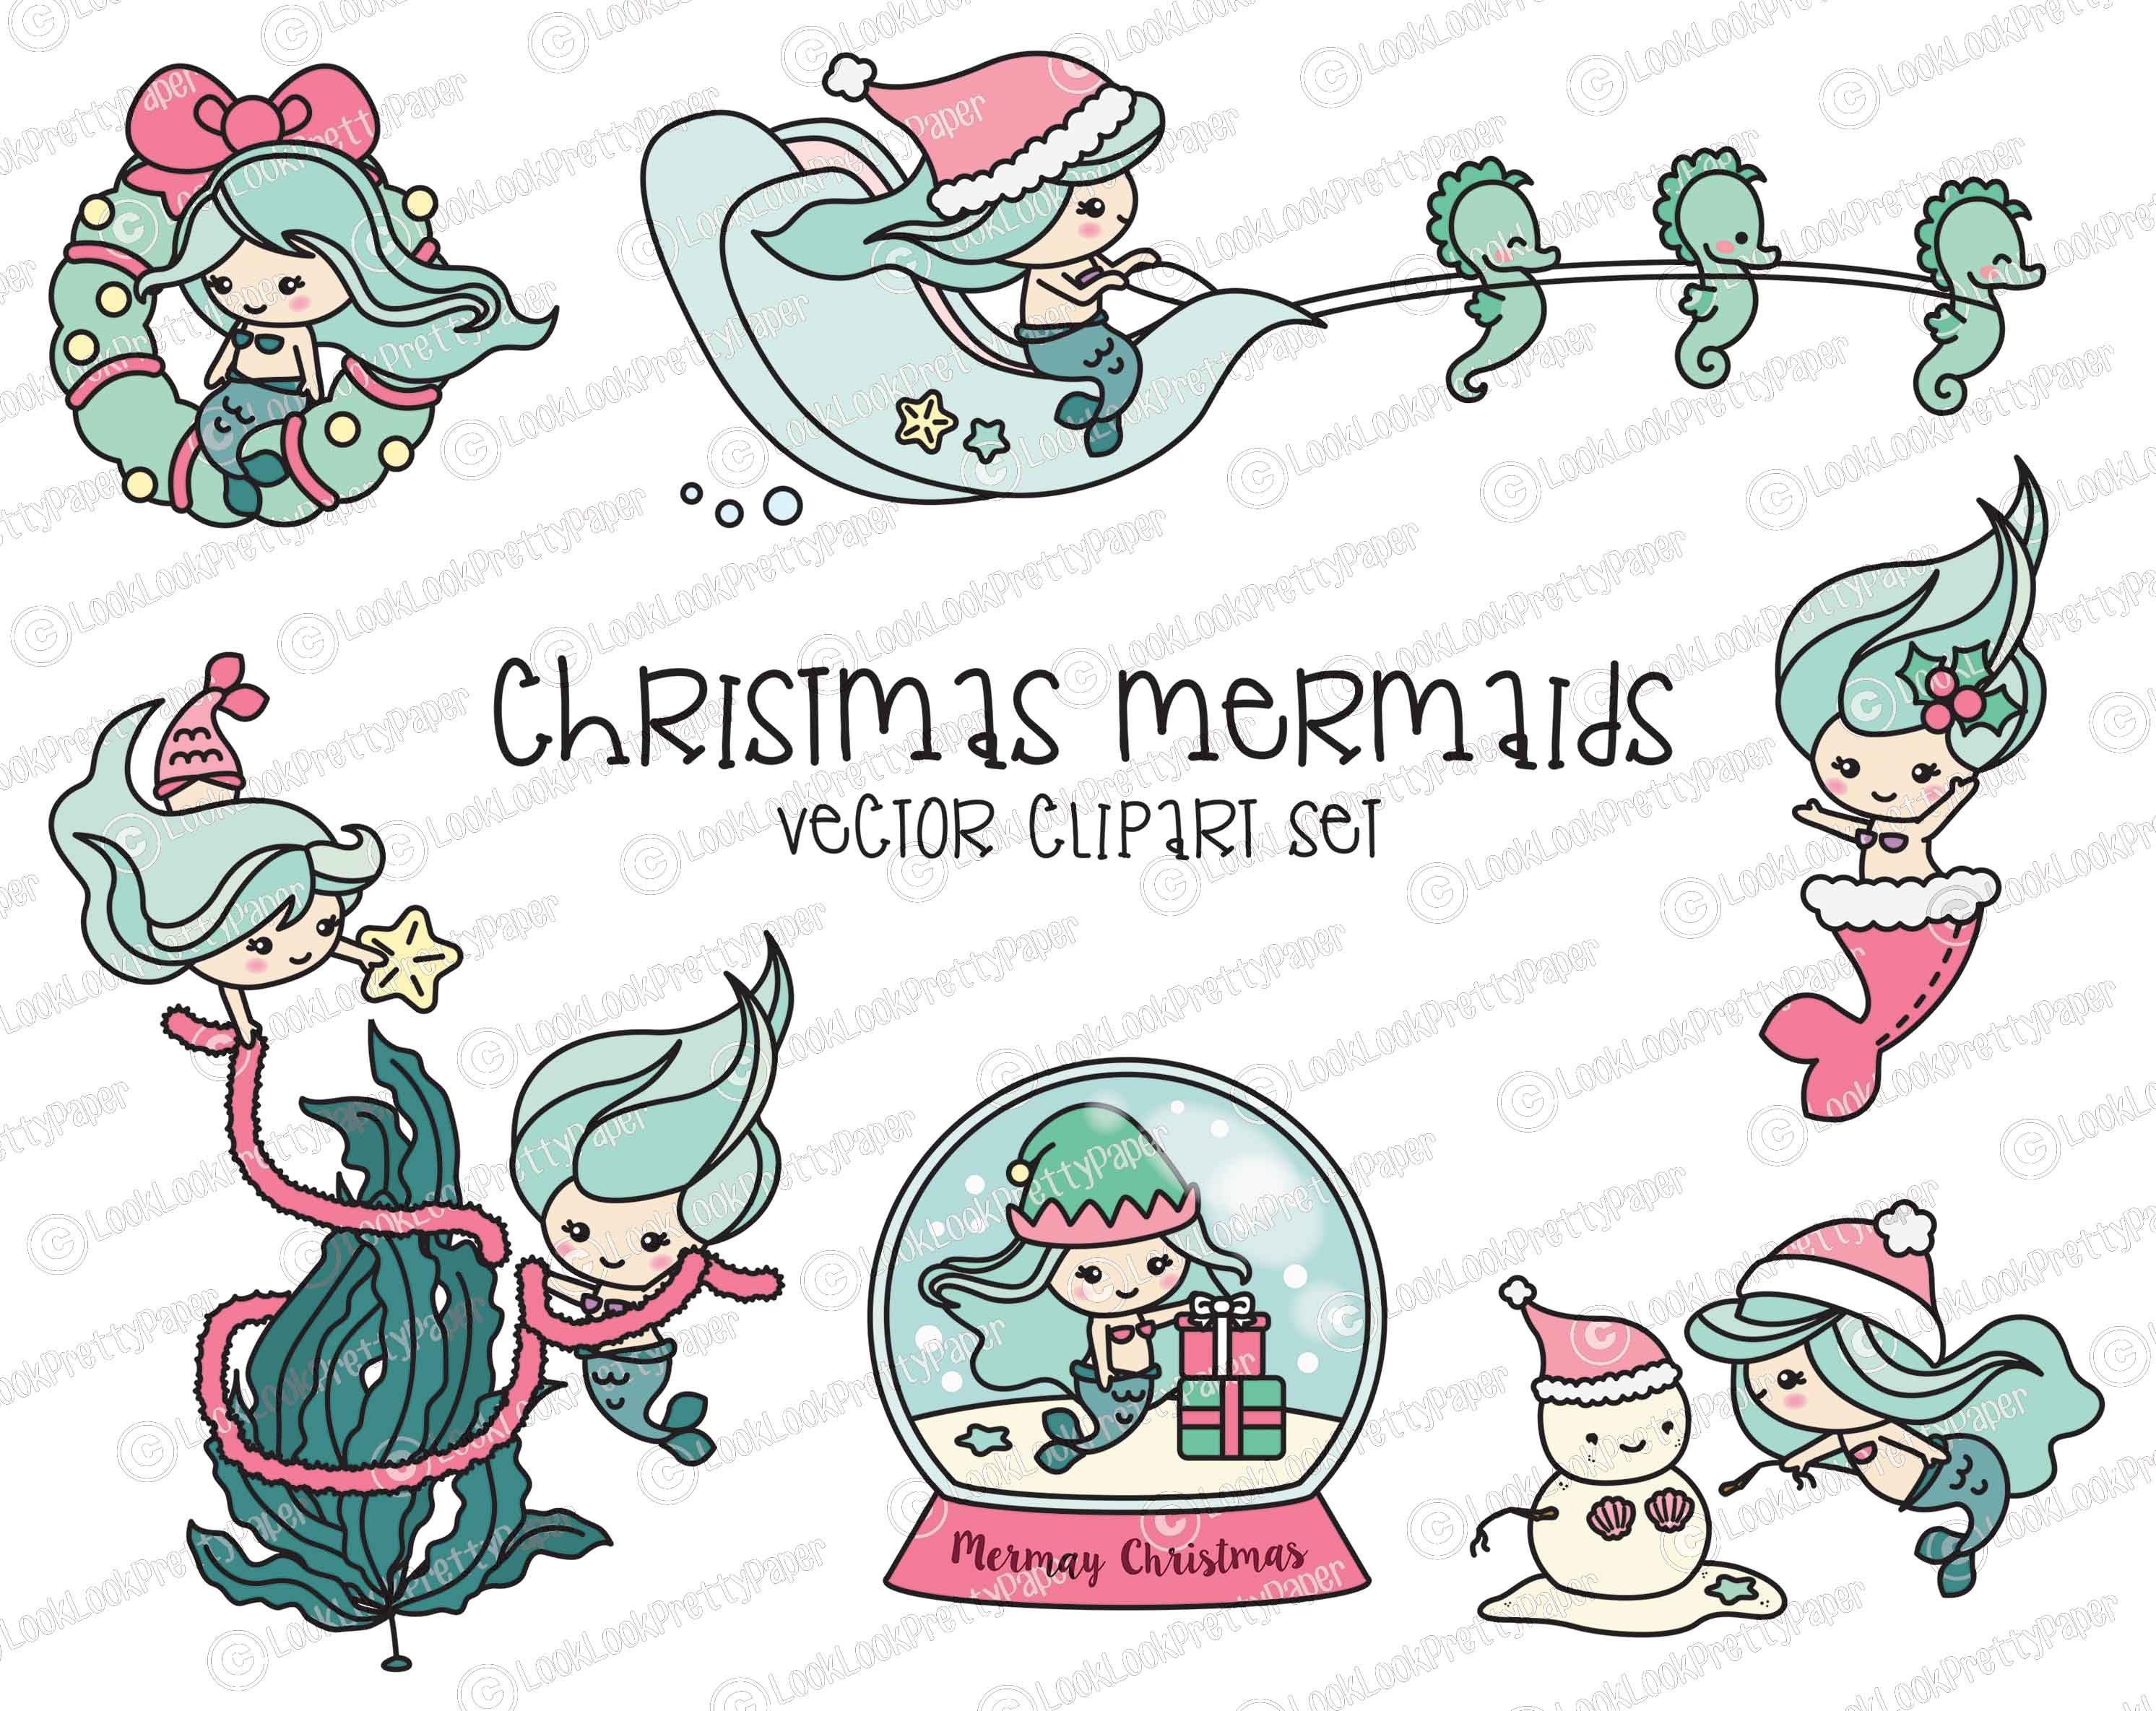 Premium Vector Clipart Kawaii Christmas Mermaids Cute | Etsy